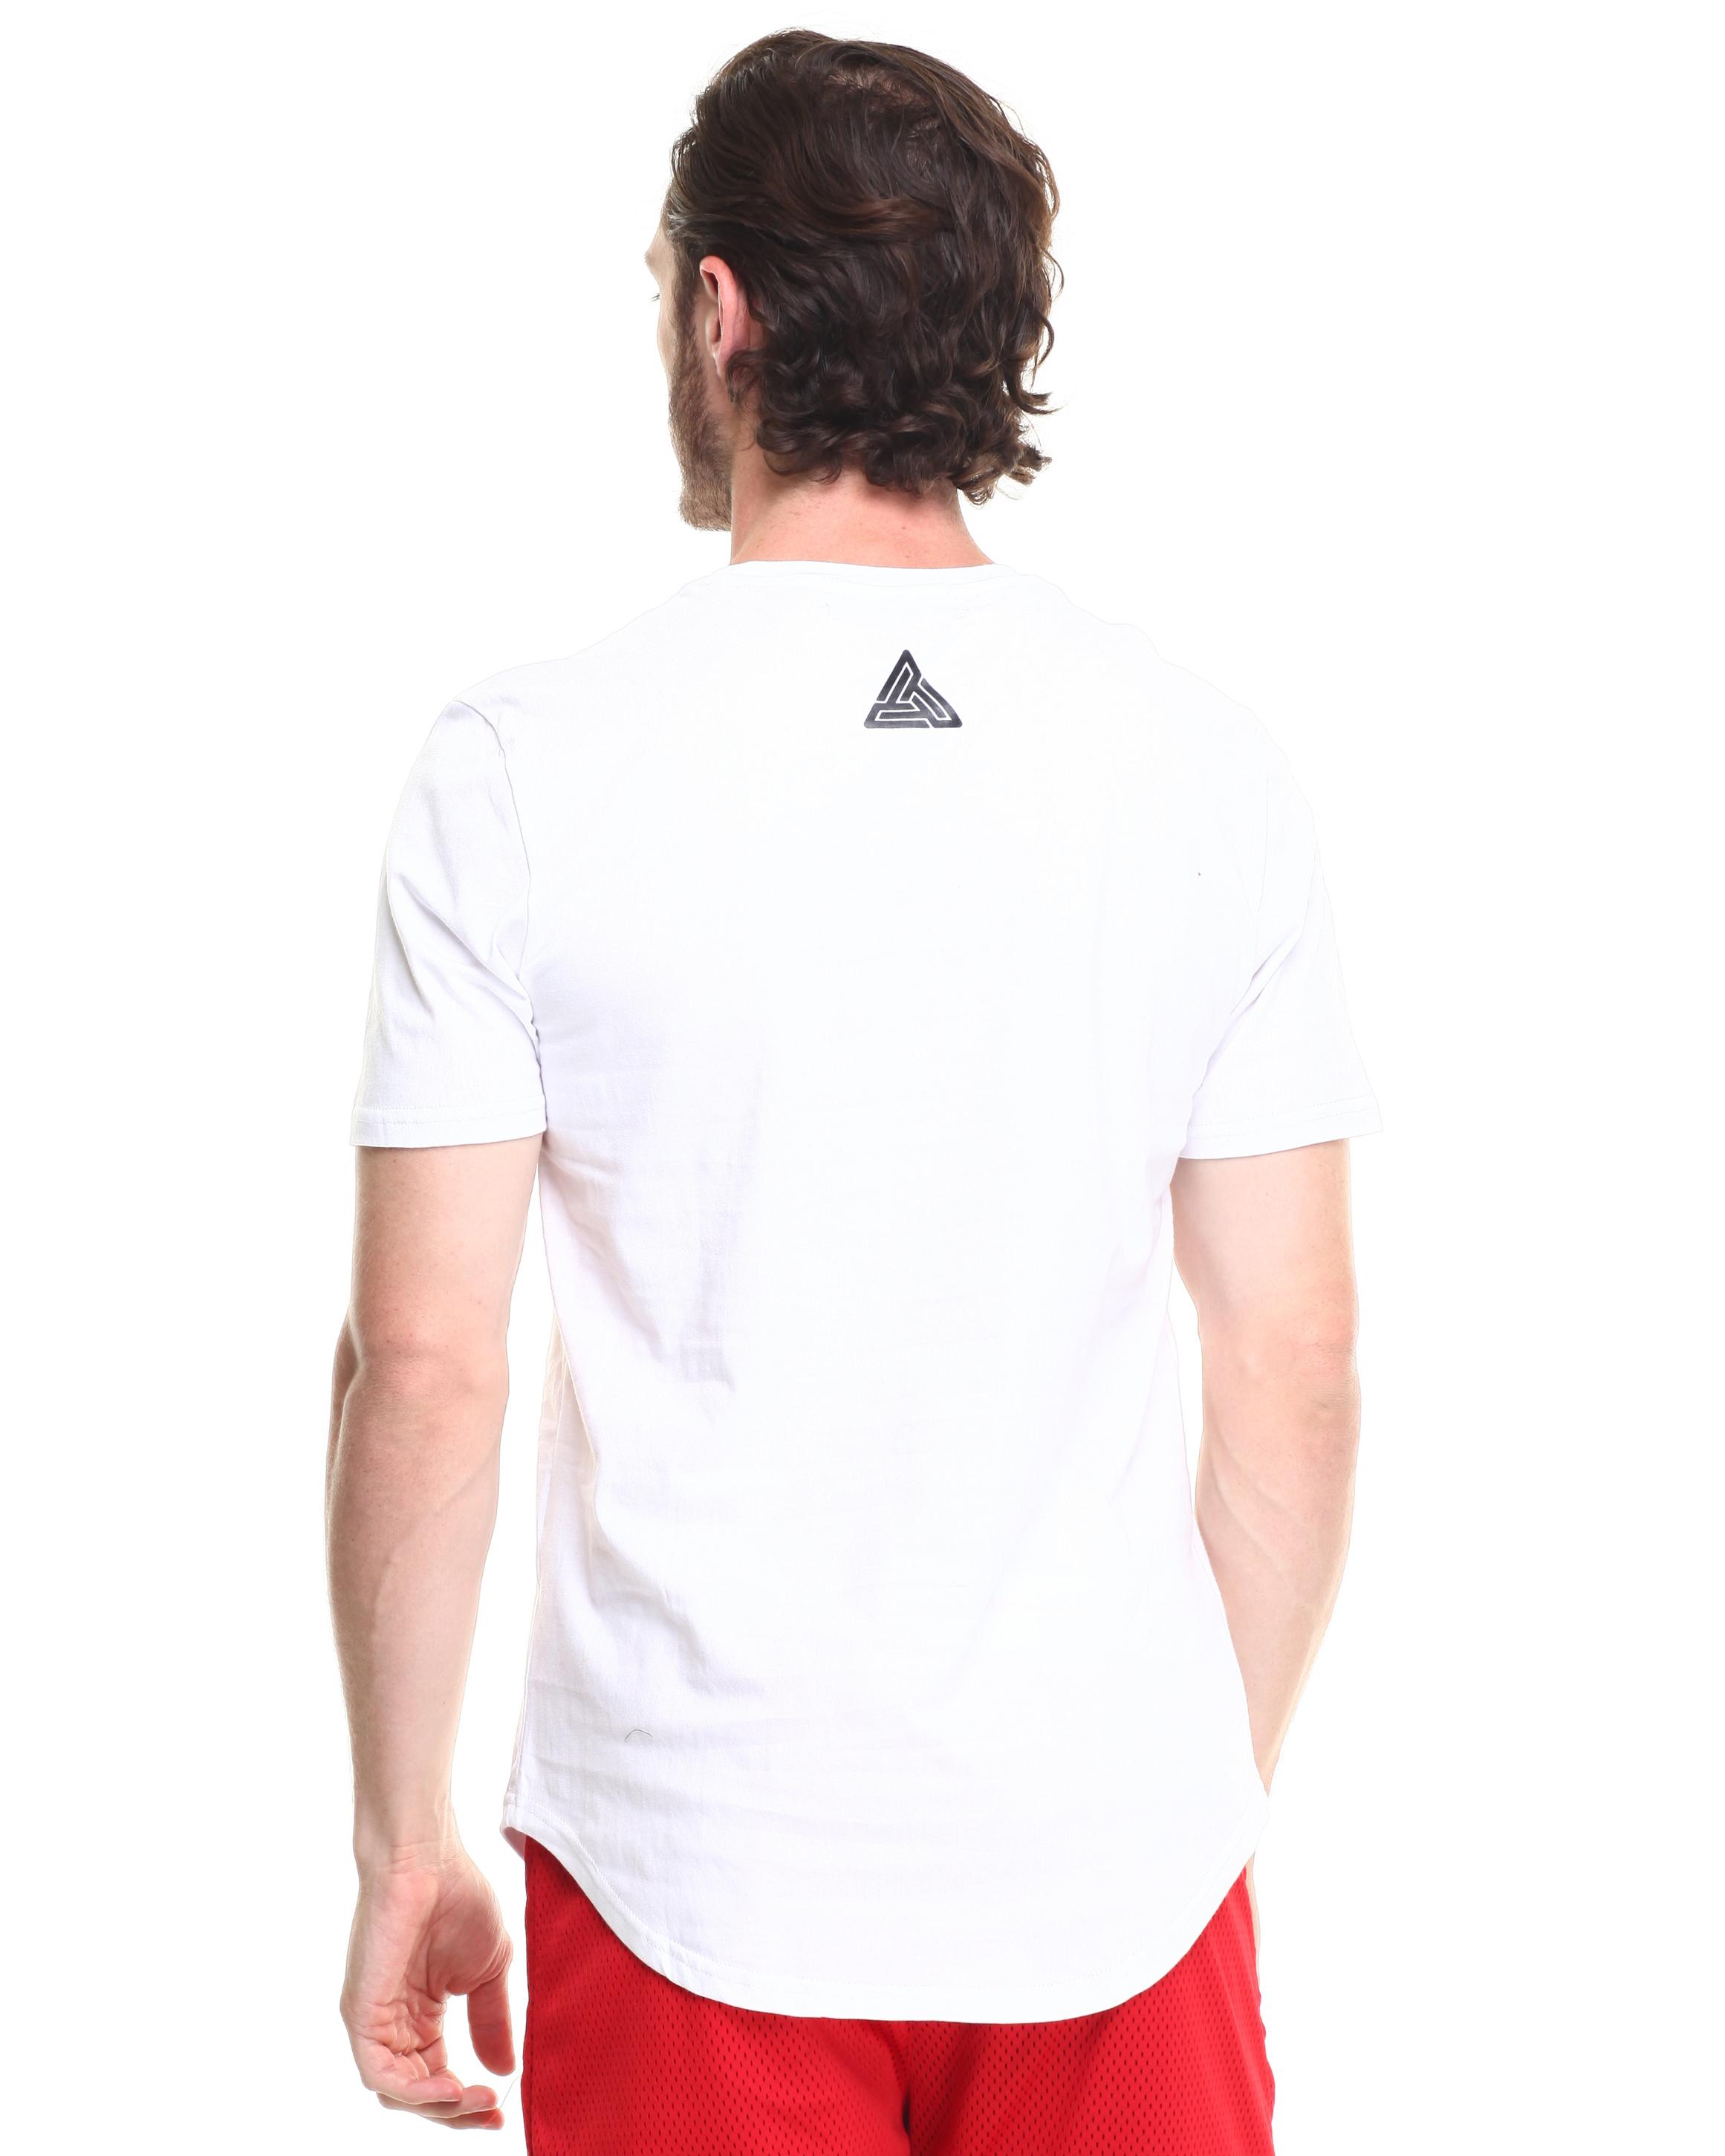 Chris brown black pyramid tee buyma for Black pyramid t shirts for sale